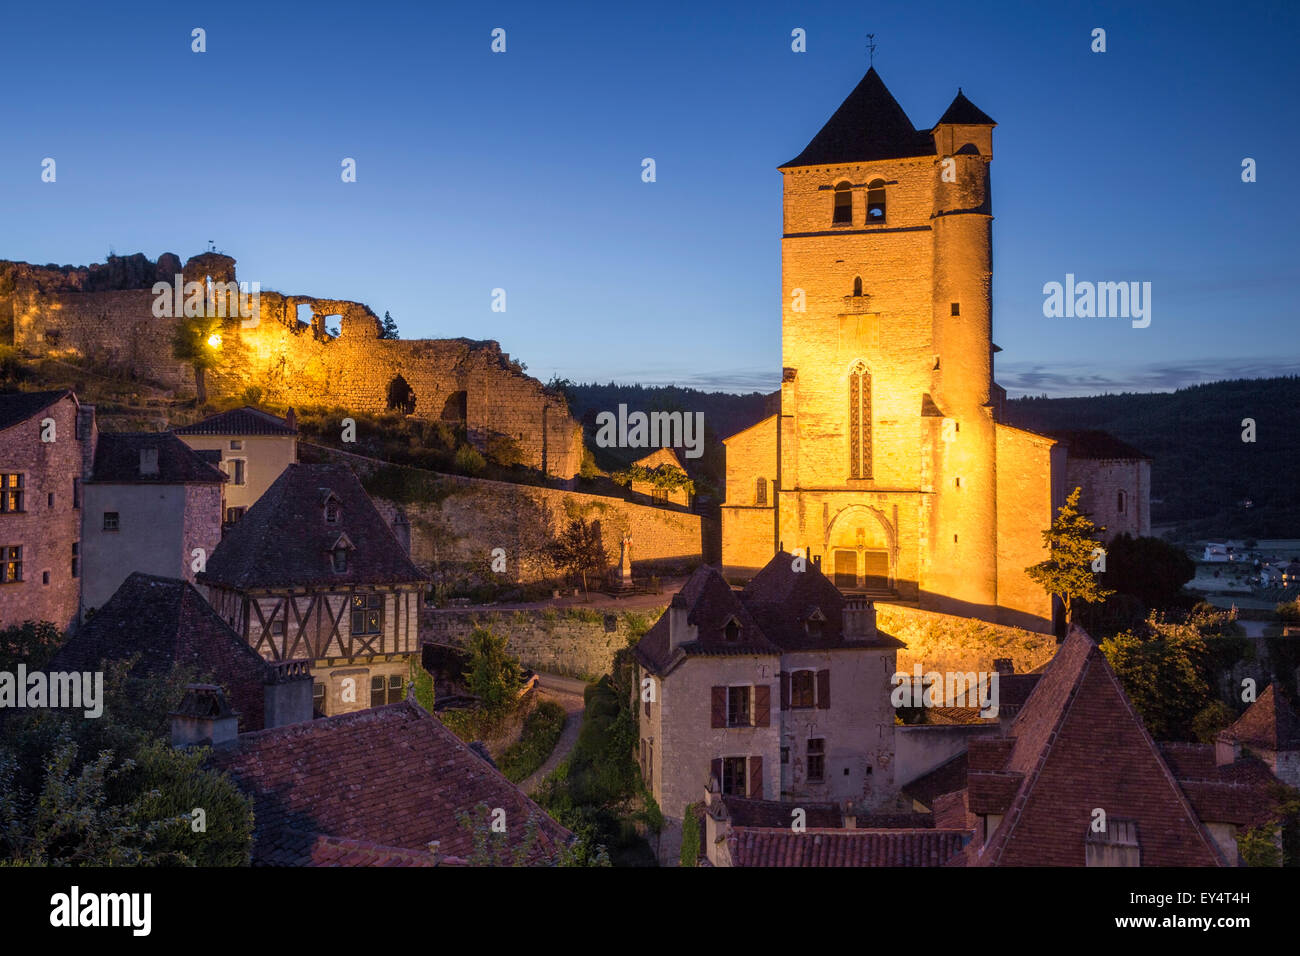 Twilight over medieval town of Saint-Cirq-Lapopie, Vallee du Lot, Midi-Pyrenees, France - Stock Image